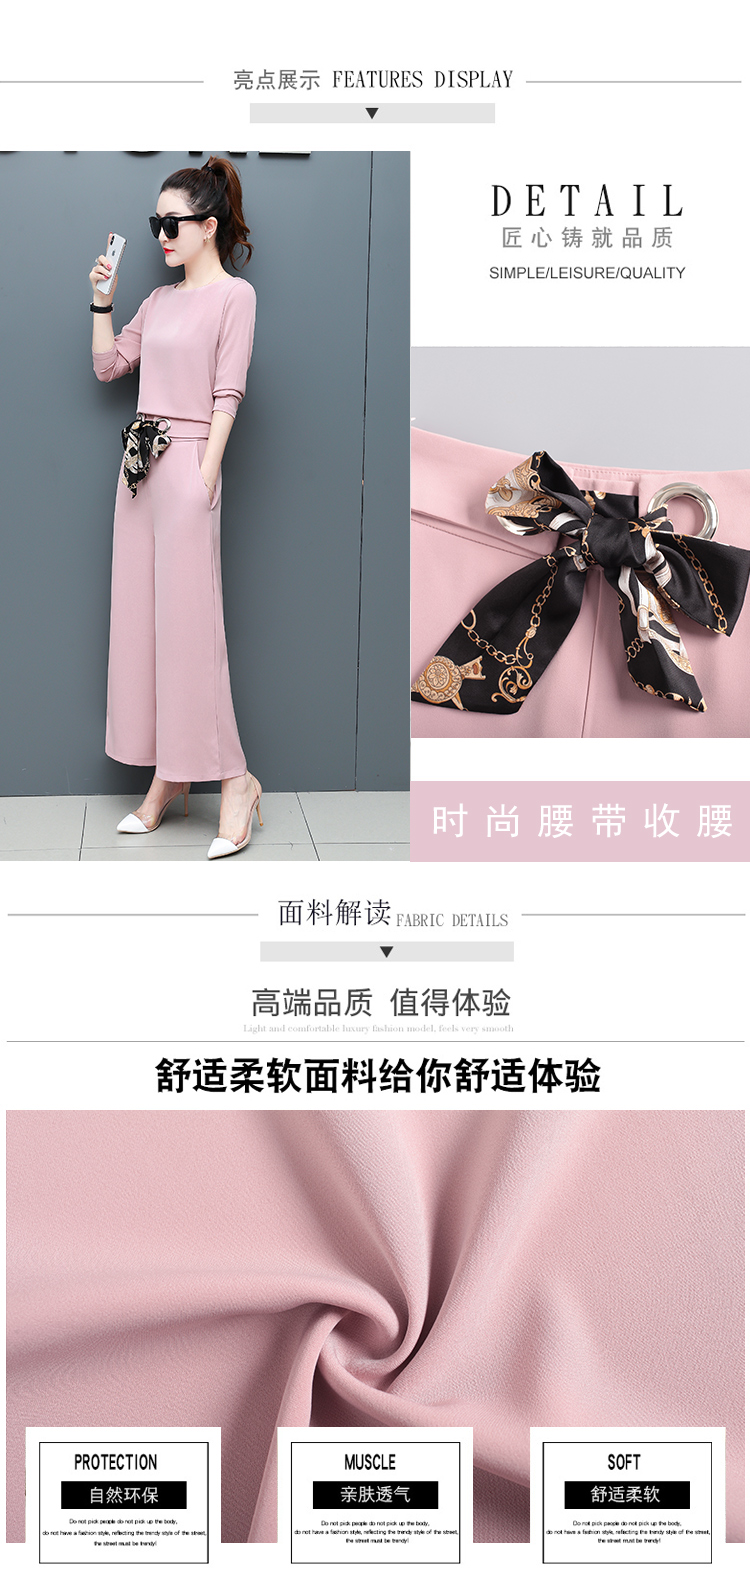 Chiffon 2 Piece Set Women Long Sleeve Tops And Wide Leg Pants Trousers Set Suits Spring Autumn Casual Office Elegant Women's Set 11